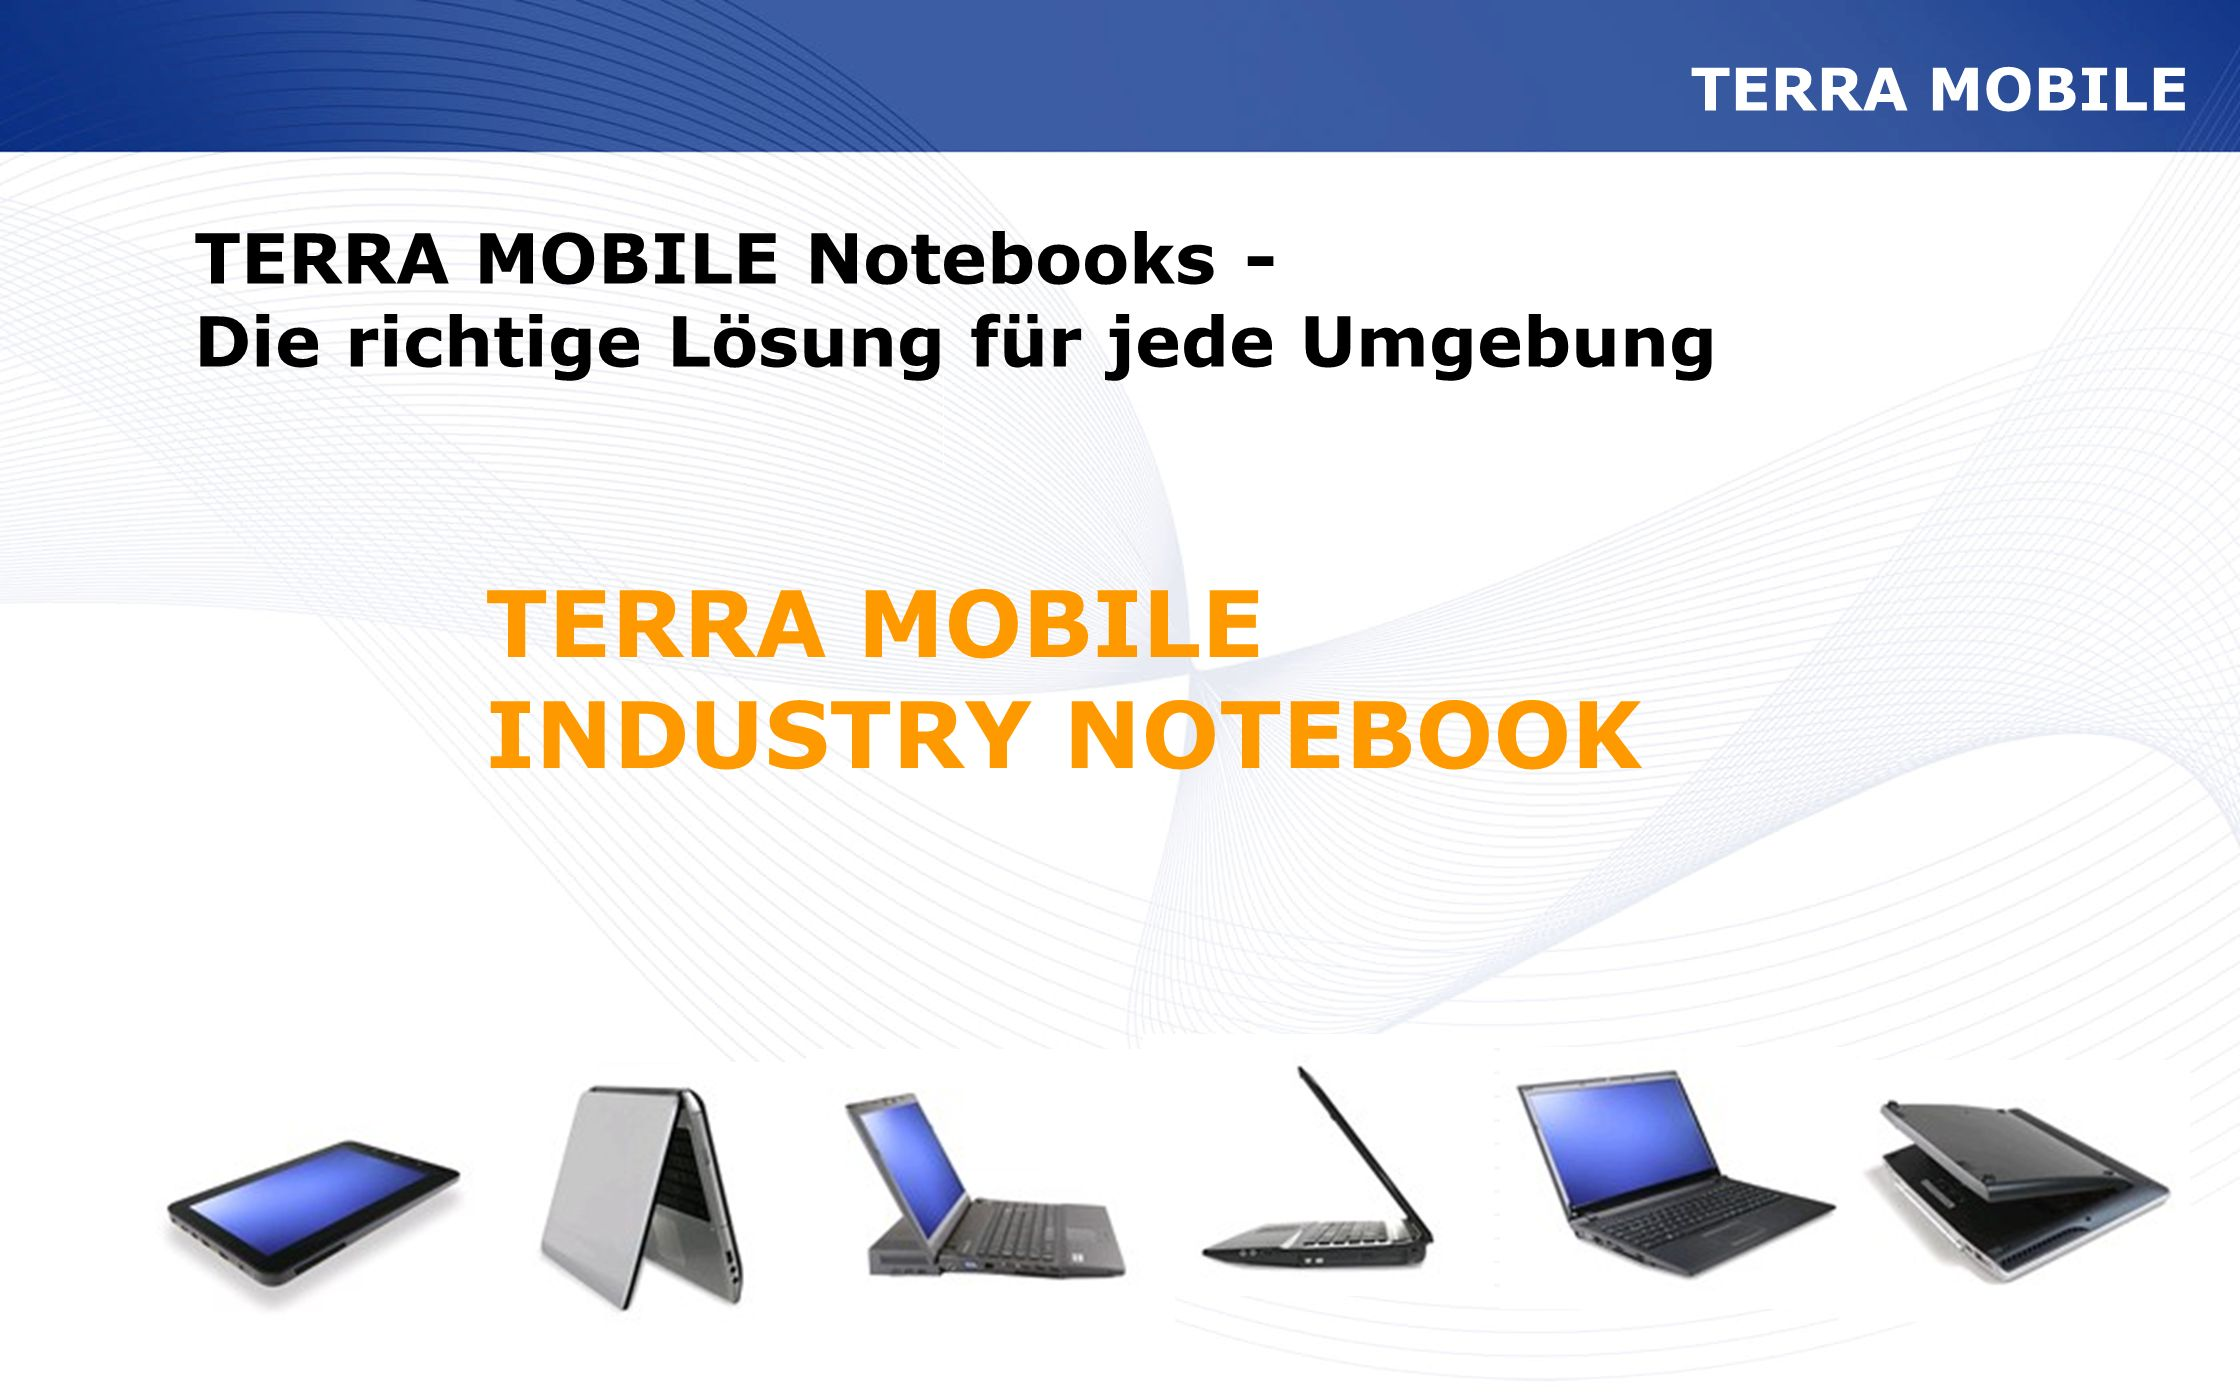 www.wortmann.de TERRA MOBILE INDUSTRY NOTEBOOK TERRA MOBILE Notebooks - Die richtige Lösung für jede Umgebung TERRA MOBILE